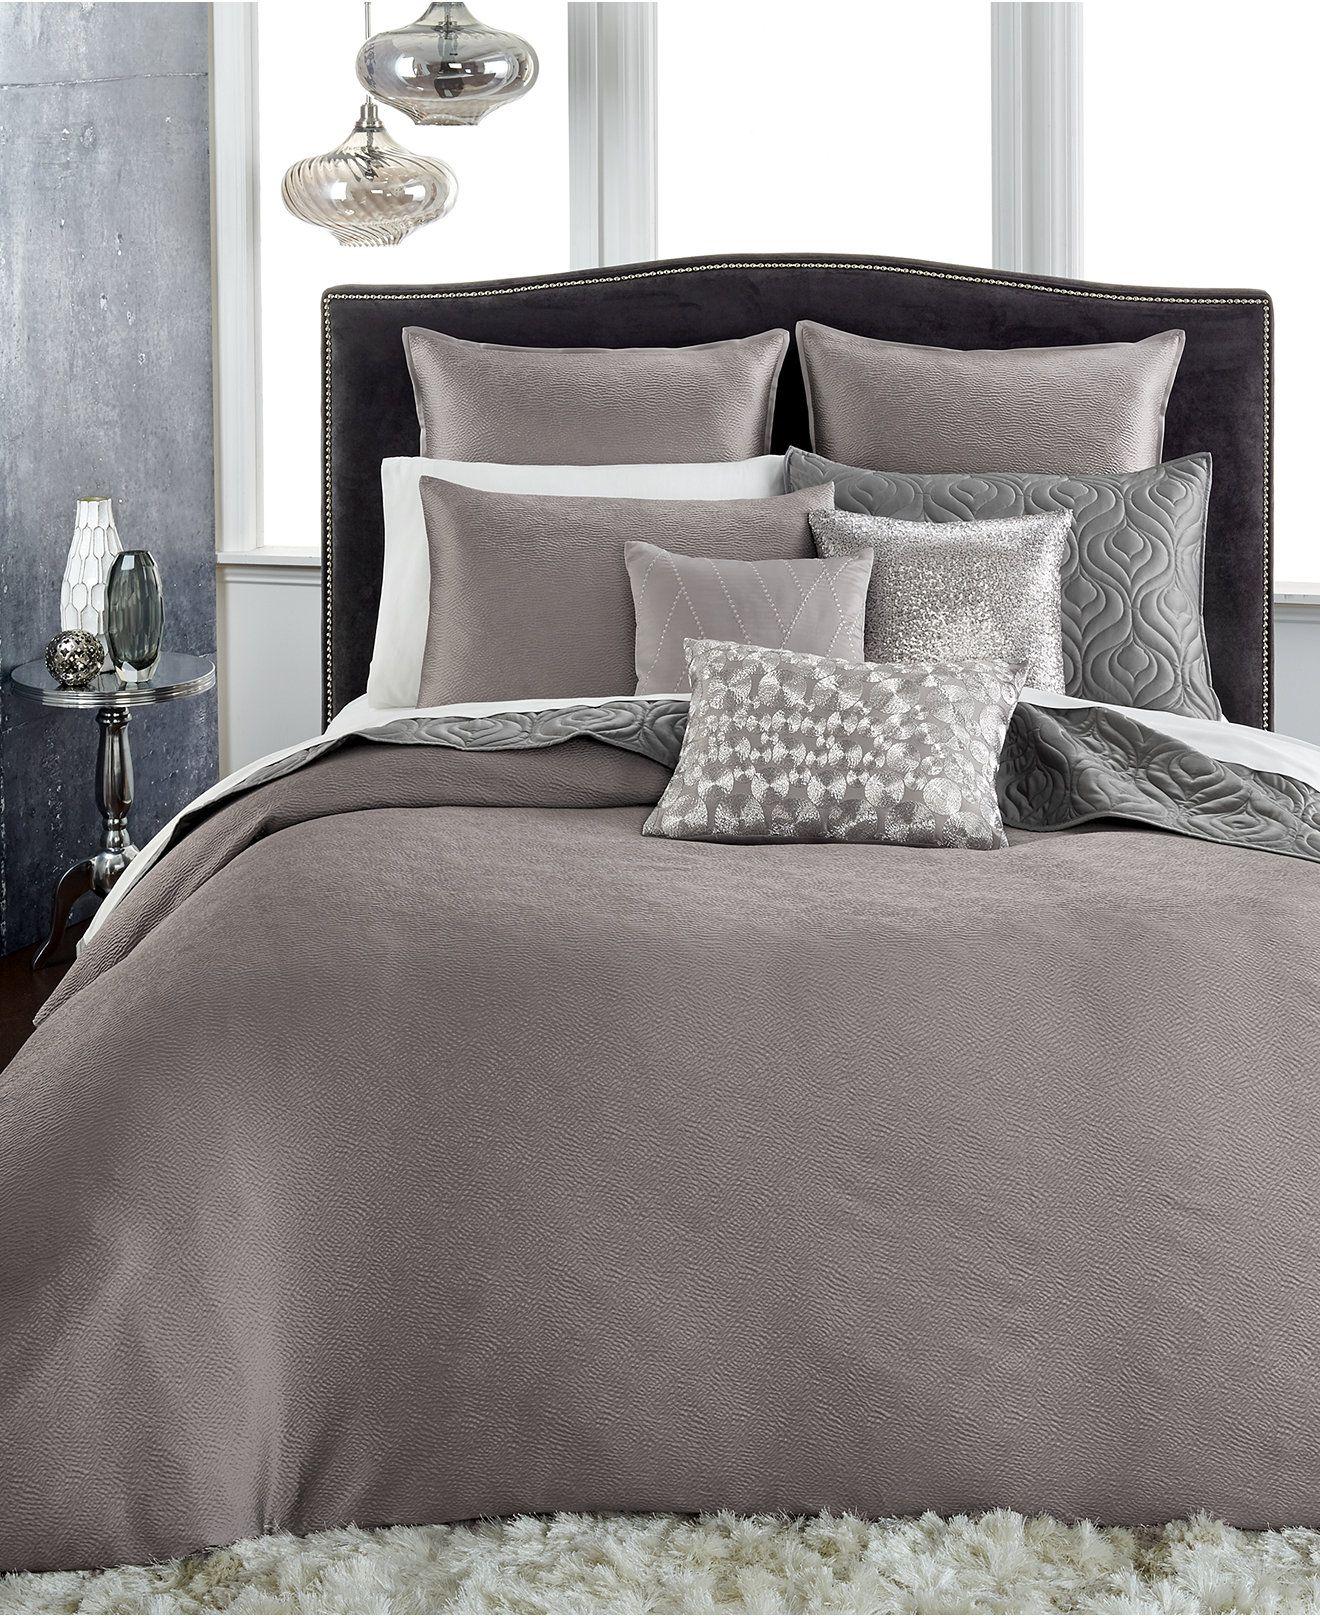 inc international concepts rizzoli gunmetal comforter and duvet